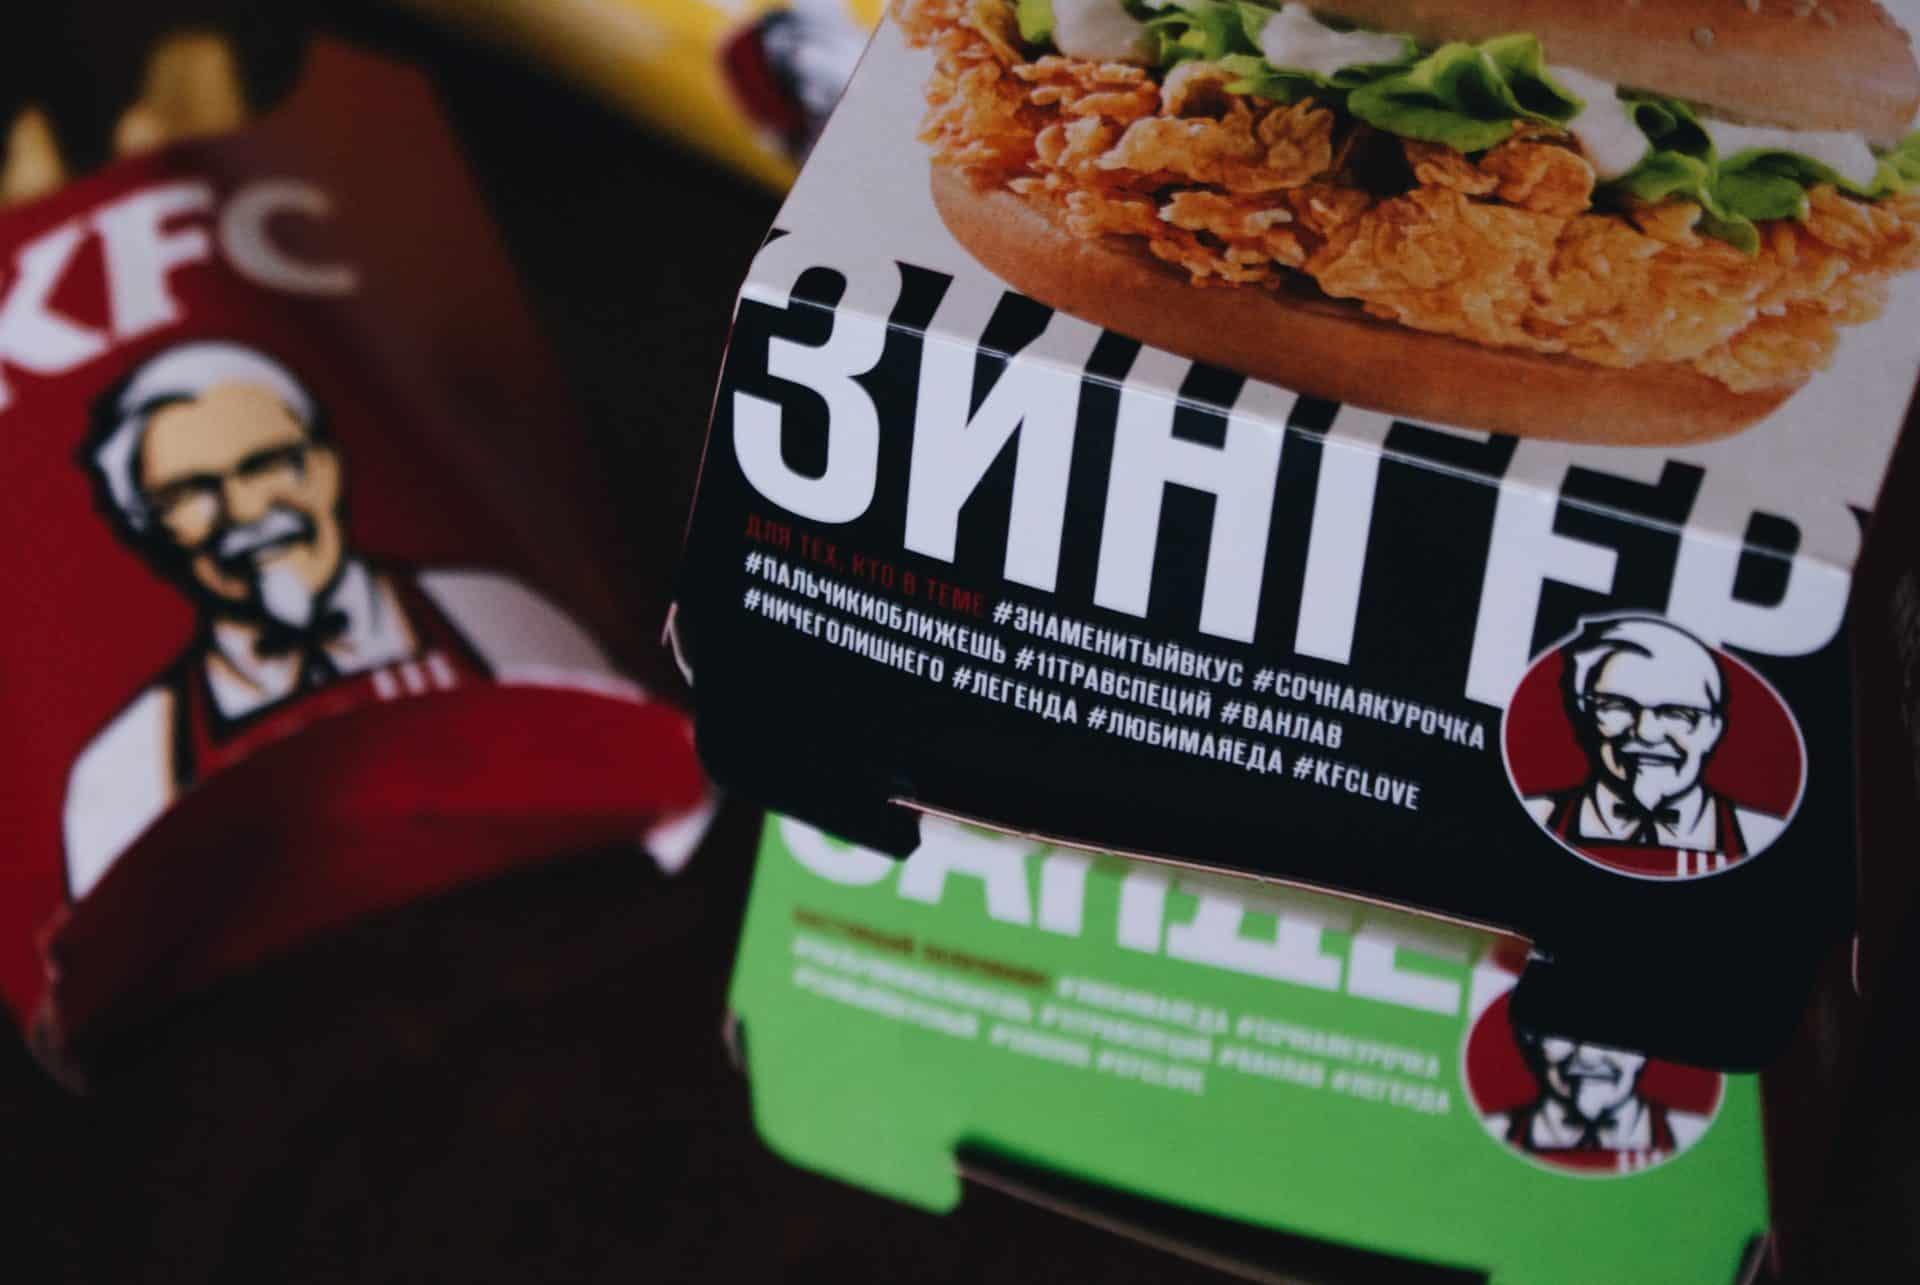 KFC Moscow